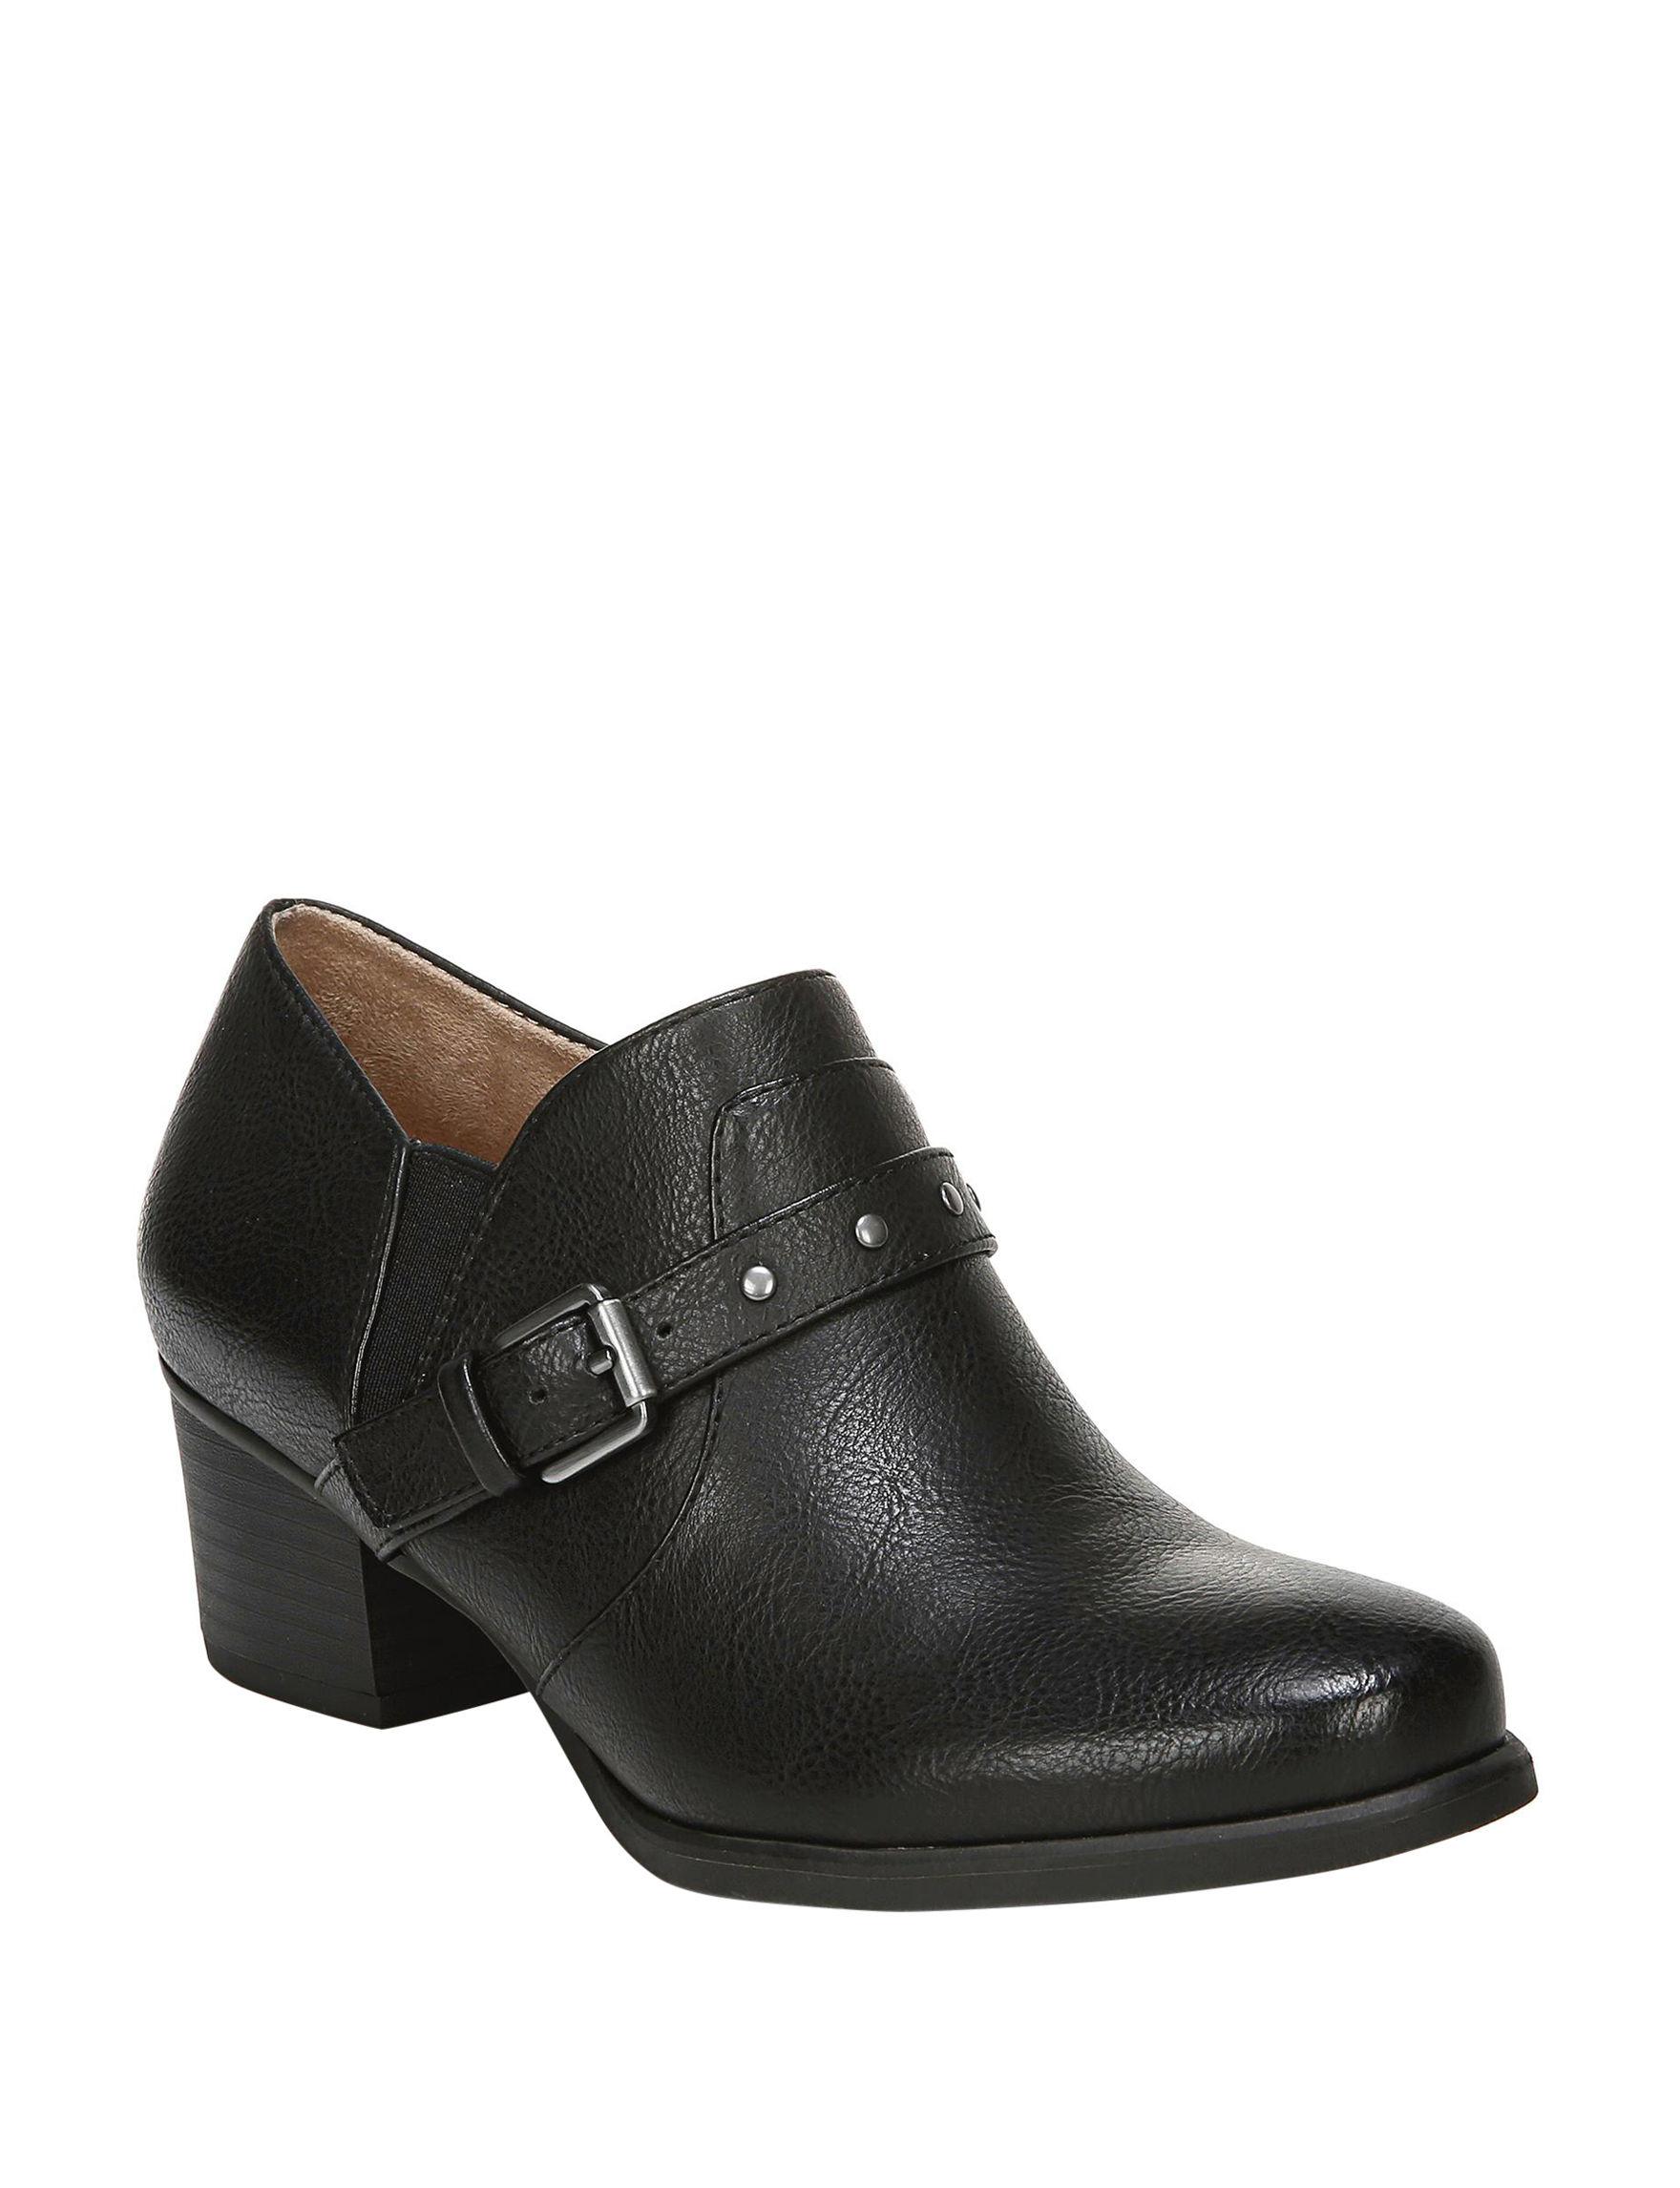 Natural Soul Black Comfort Shoes